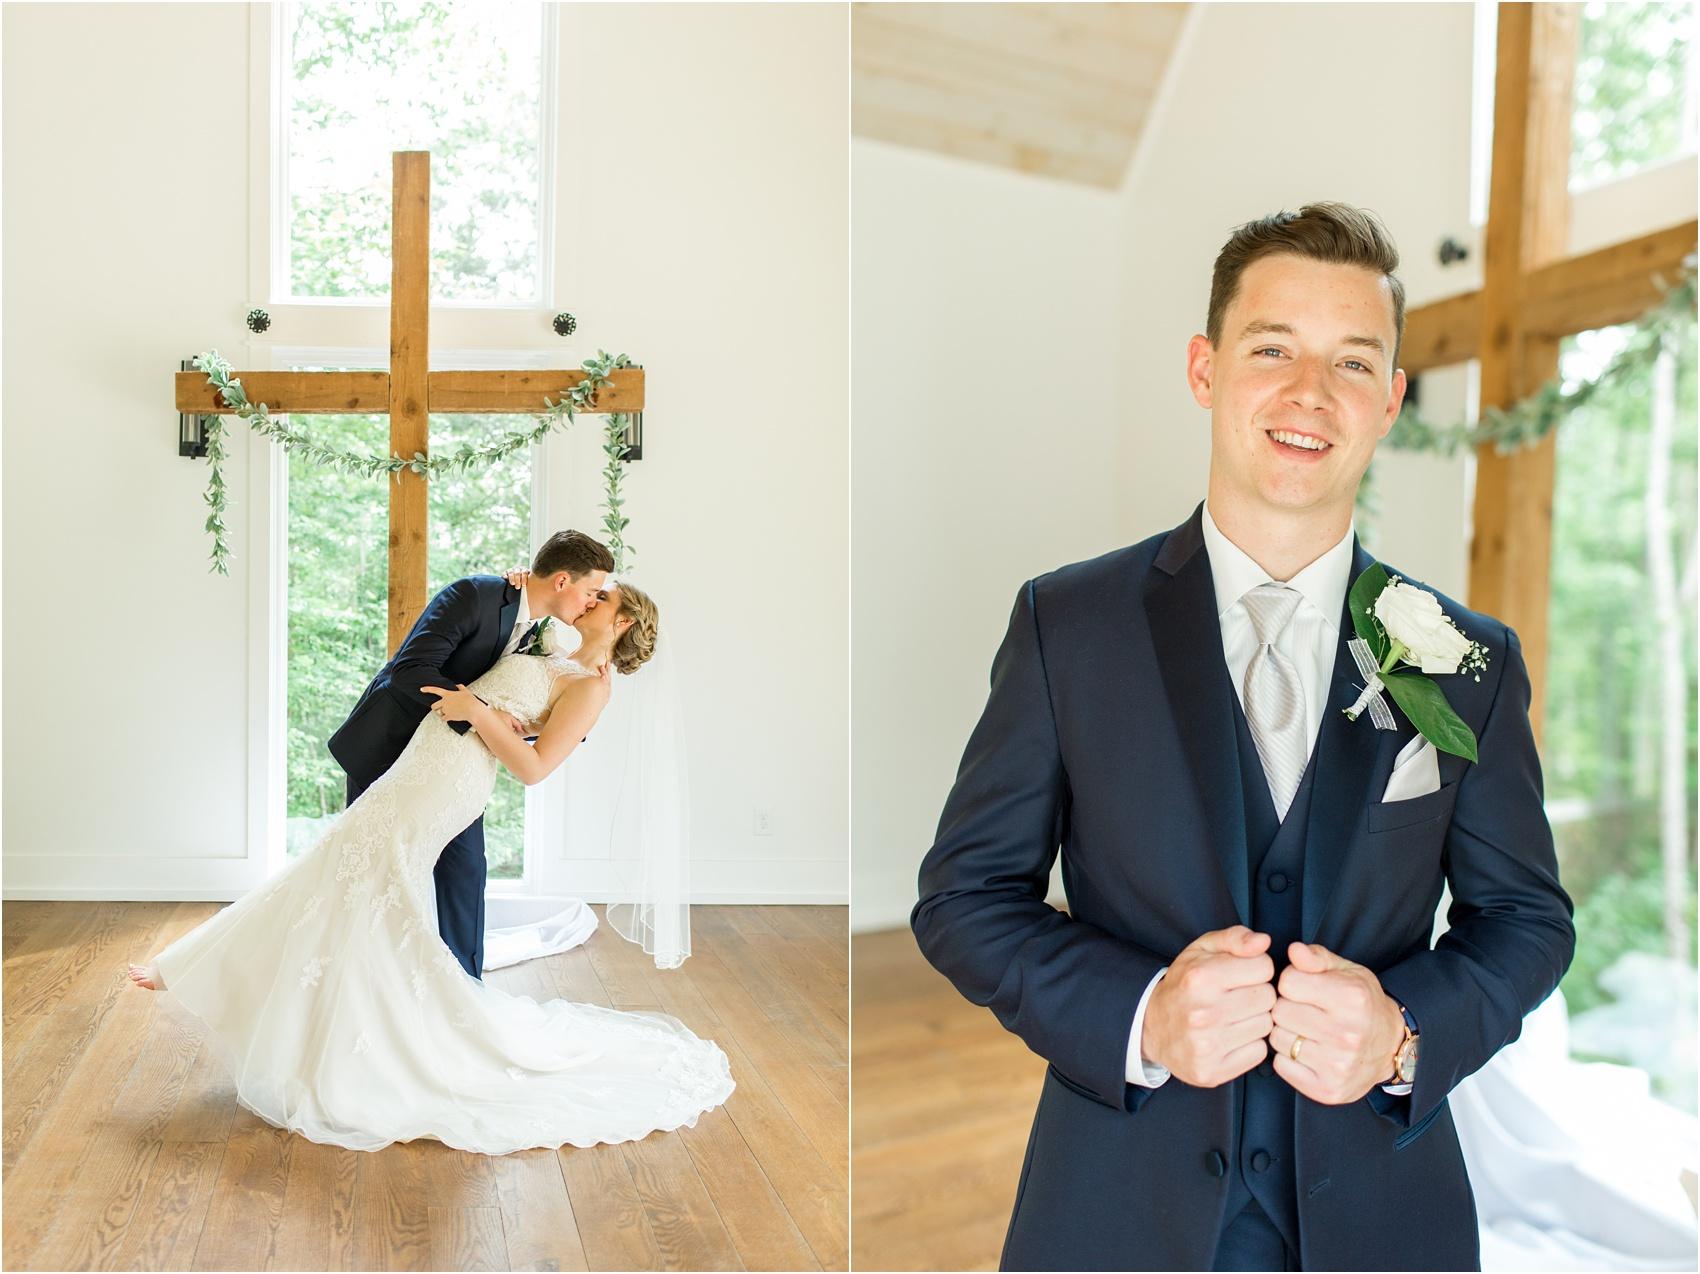 Savannah Eve Photography- Roper-Powell Wedding- Blog-51.jpg